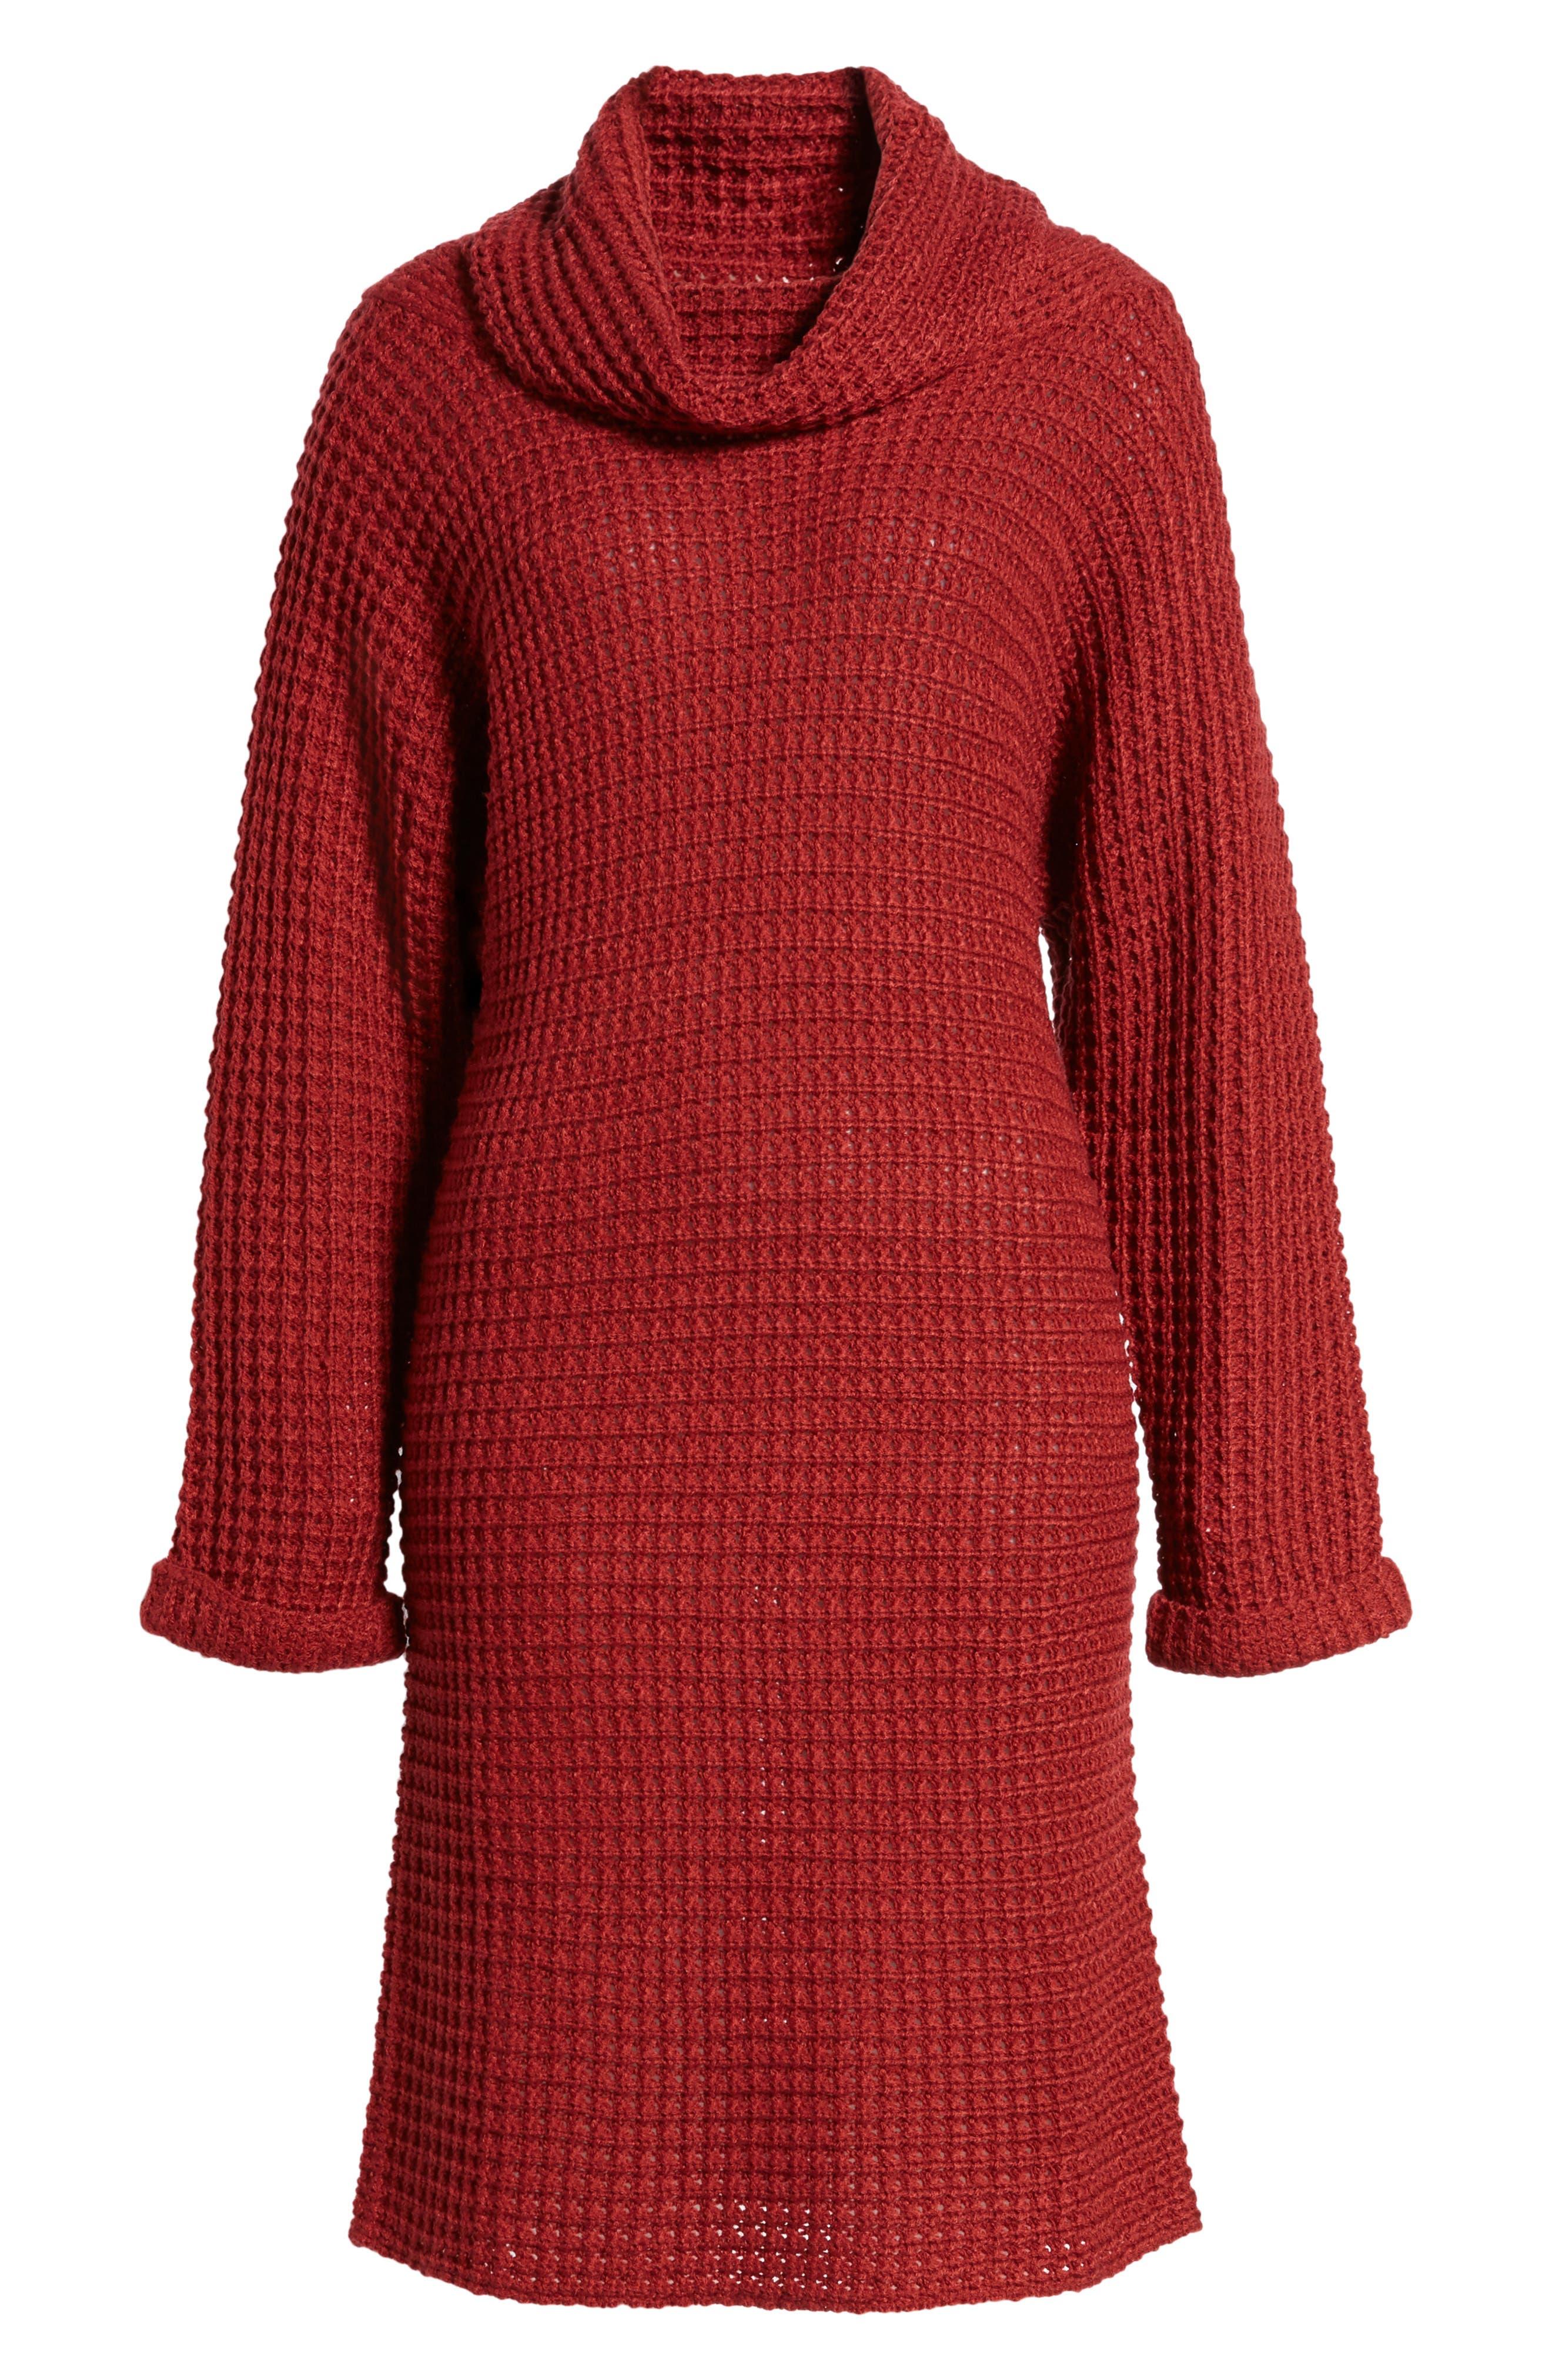 Turtleneck Sweater Dress,                             Alternate thumbnail 12, color,